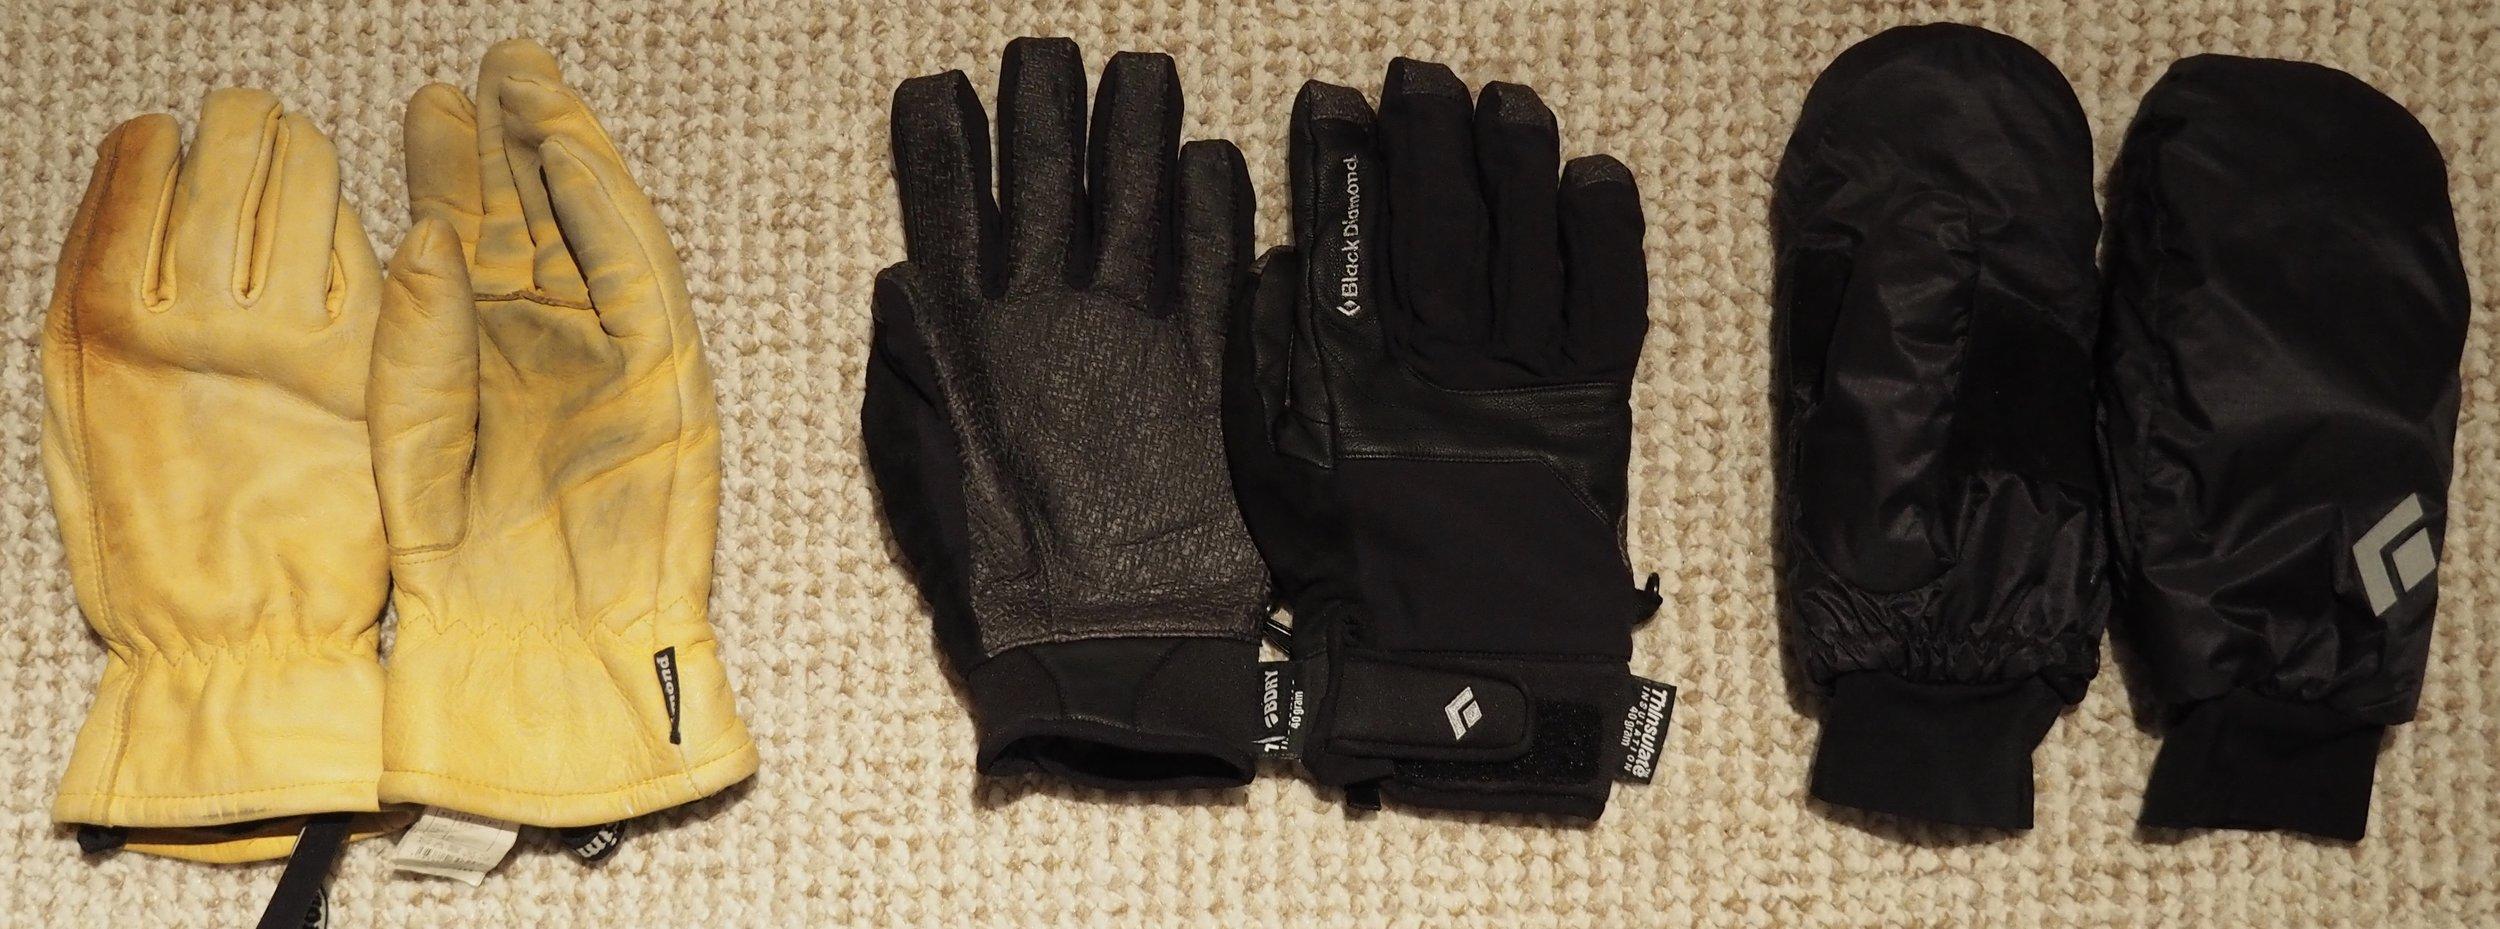 Simond Work Gloves, Black Diamond Arc Gloves, Black Diamond Stance Mitts